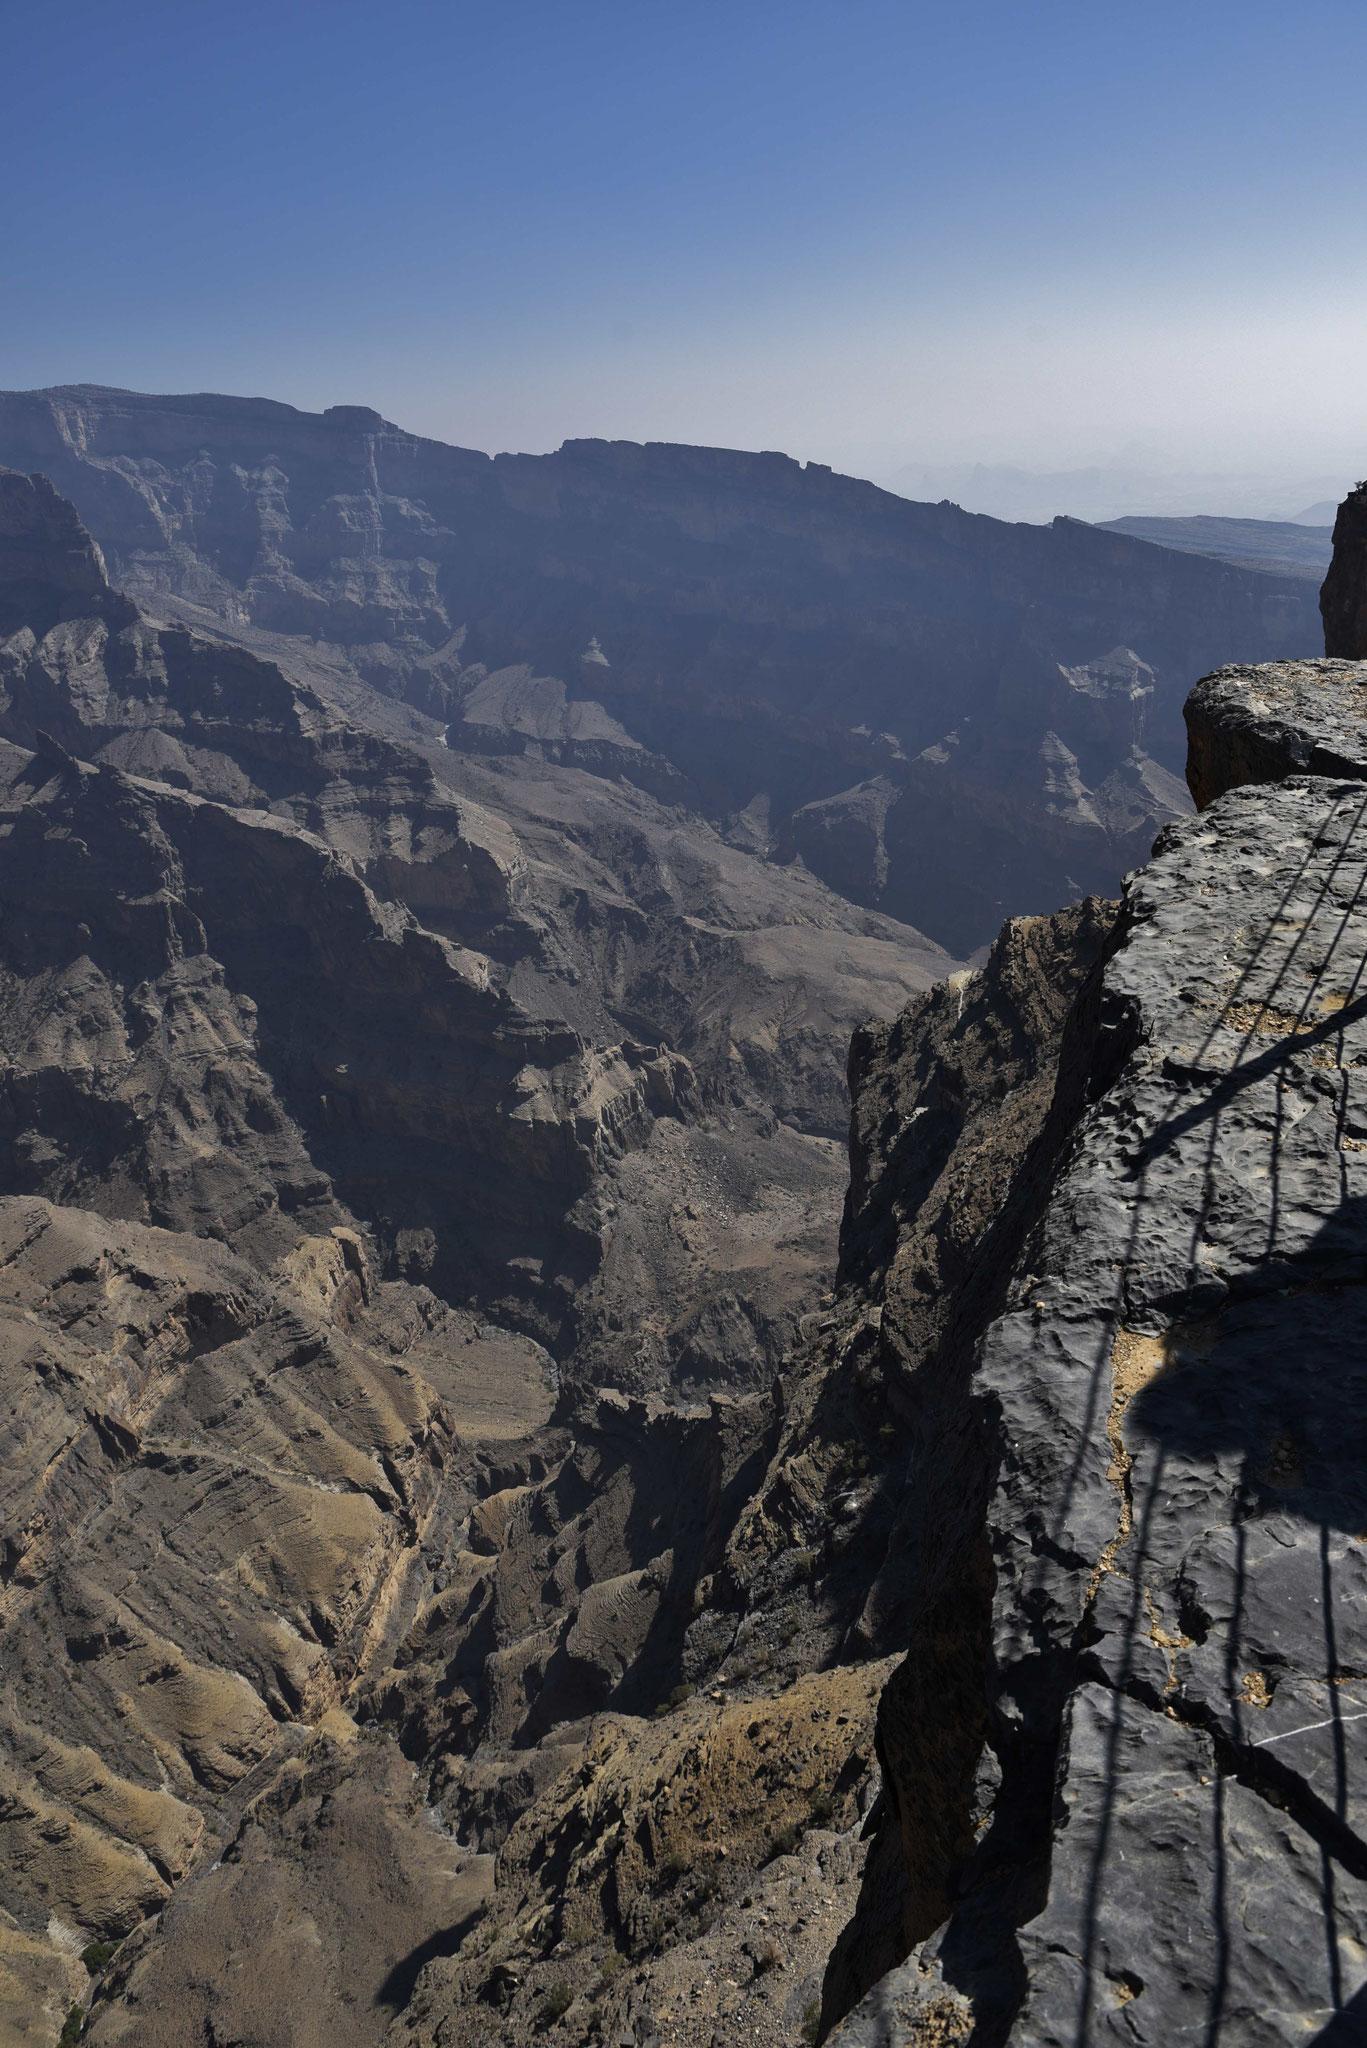 Blick entgegengesetzt entlang des Canyons